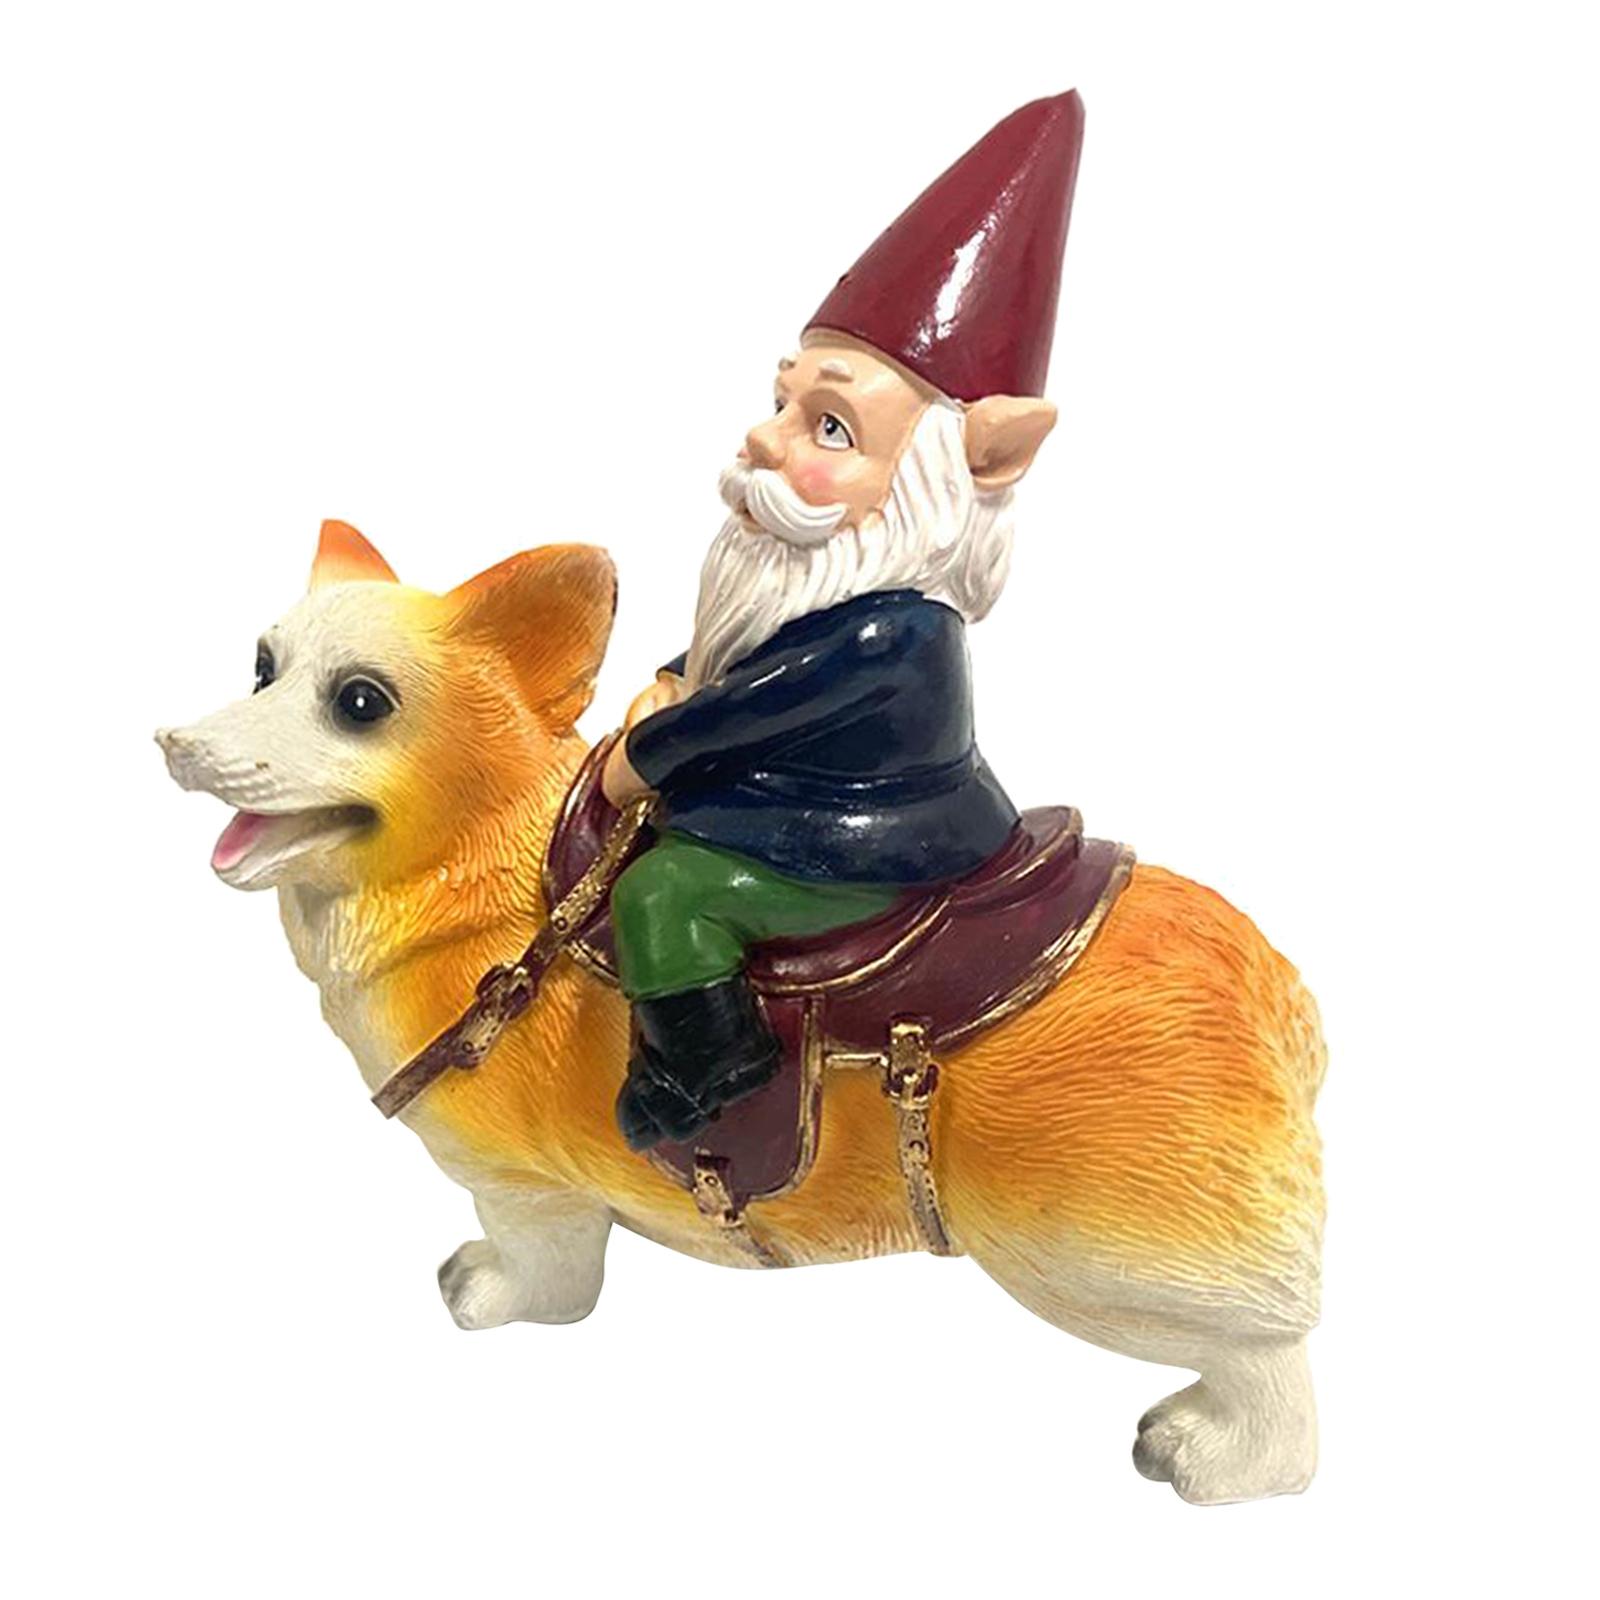 thumbnail 31 - Funny Resin Naughty Garden Gnome Statue Ornaments Outdoor Villa Home Figurines